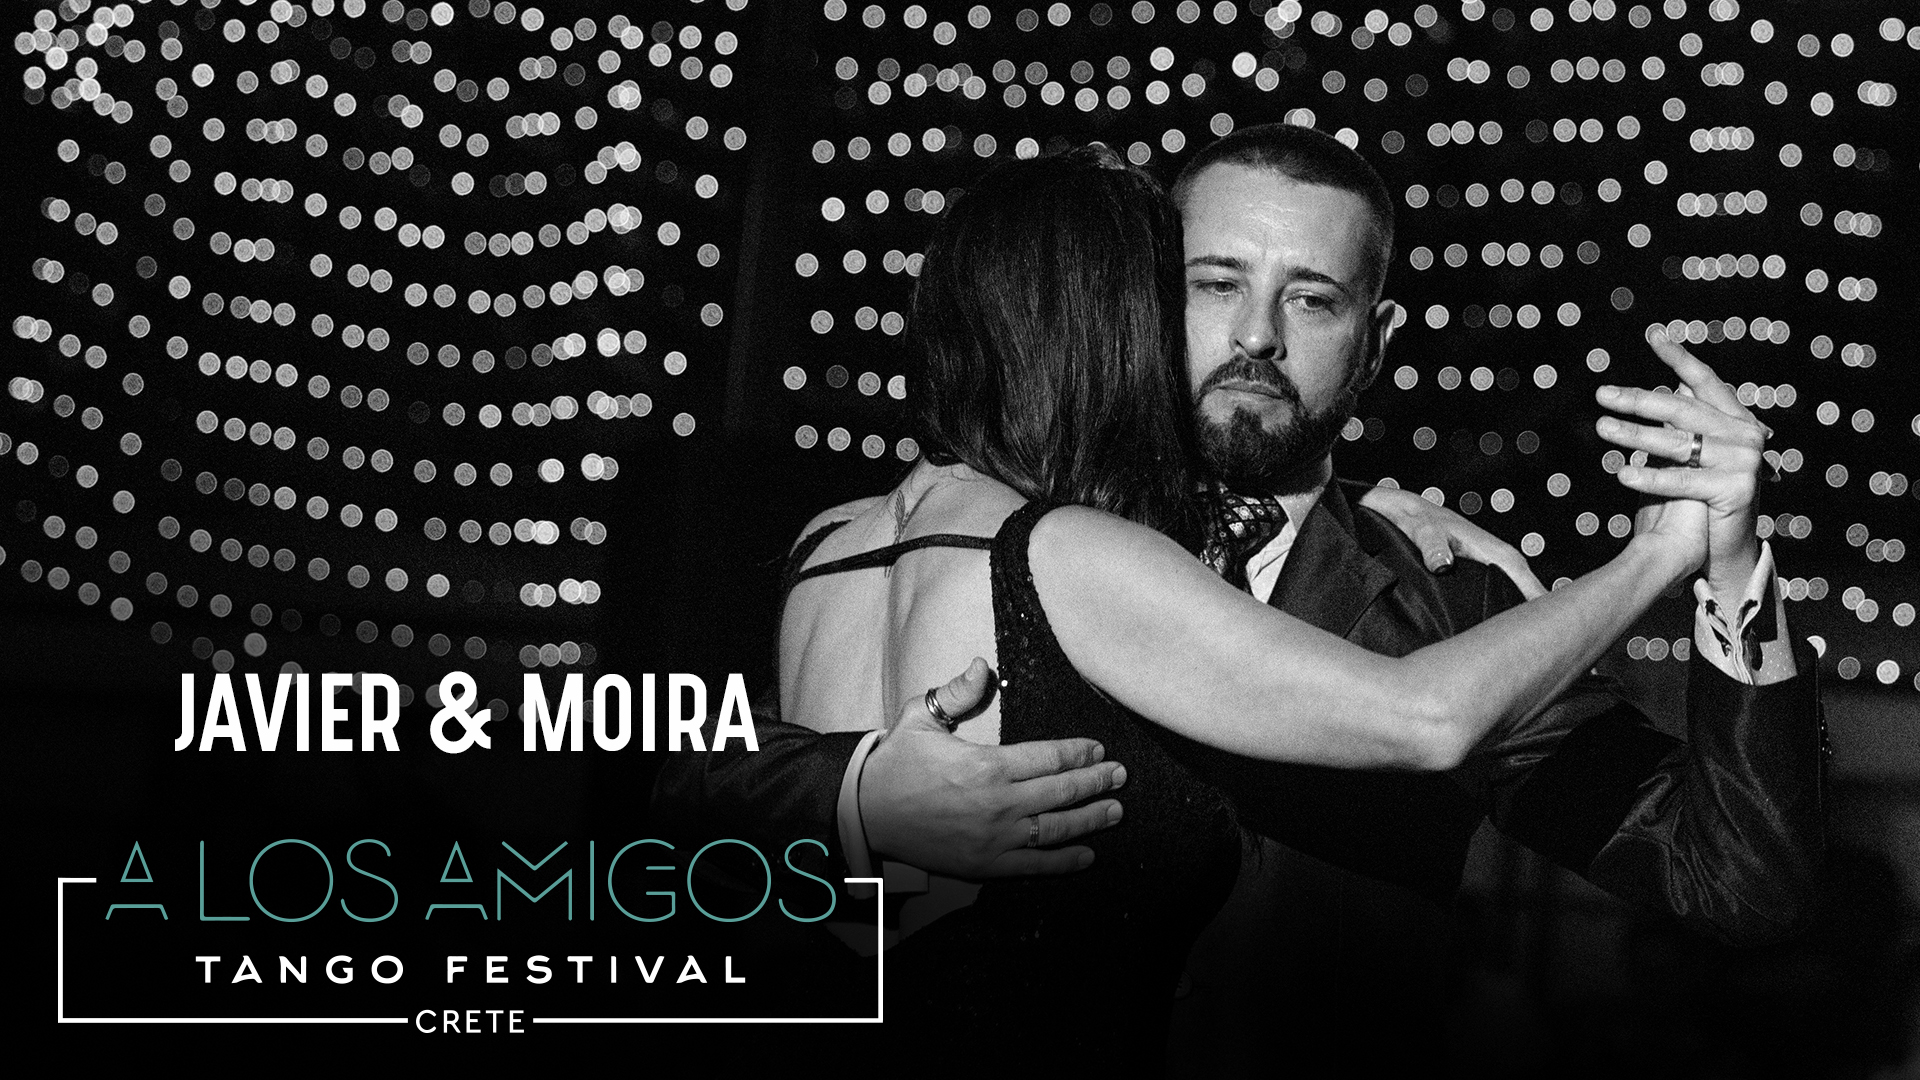 Sivis'art Videomaker presents Javier Rodriguez & Moira Castellano